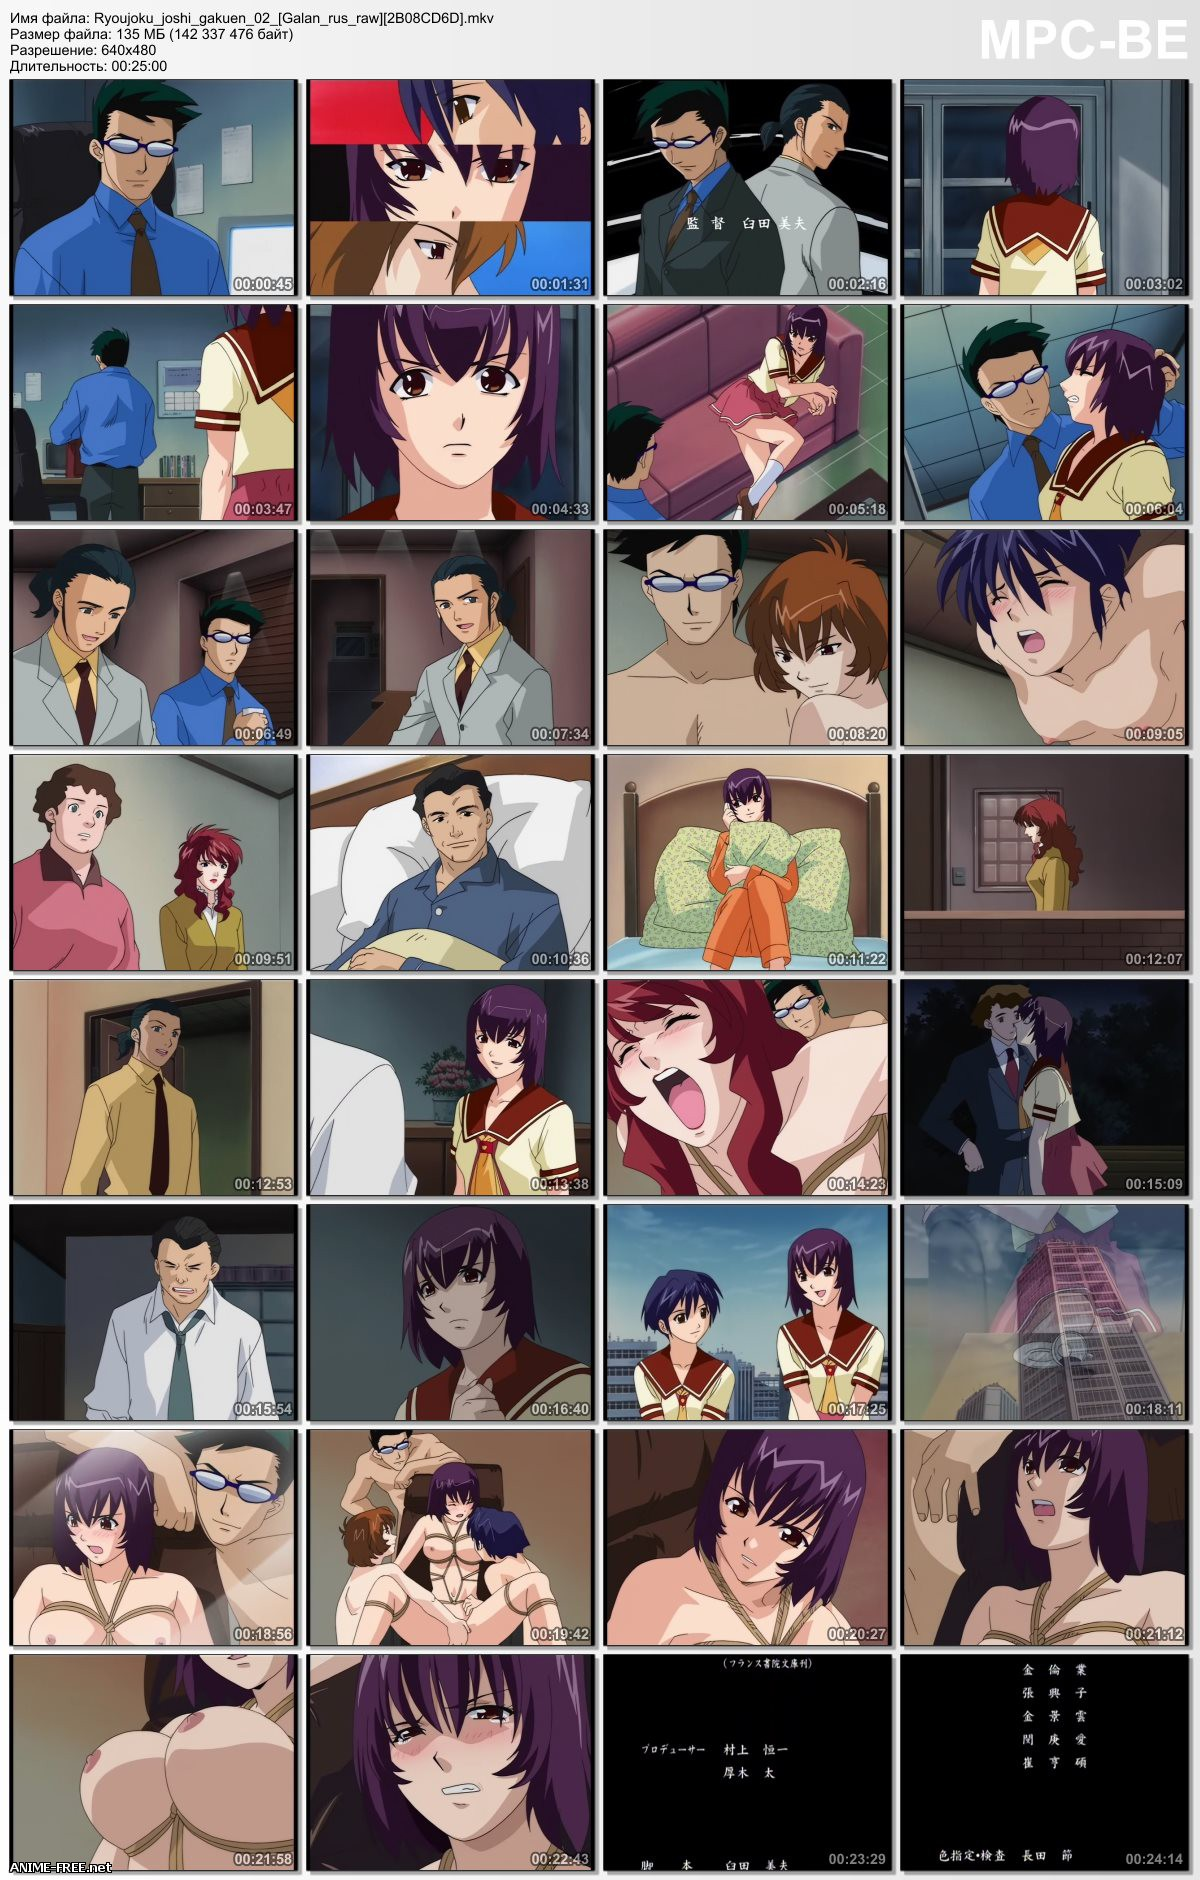 Ryoujoku Joshi Gakuen / Школа унижения девушки [Ep.1-2] [JAP,CHI] Anime Hentai